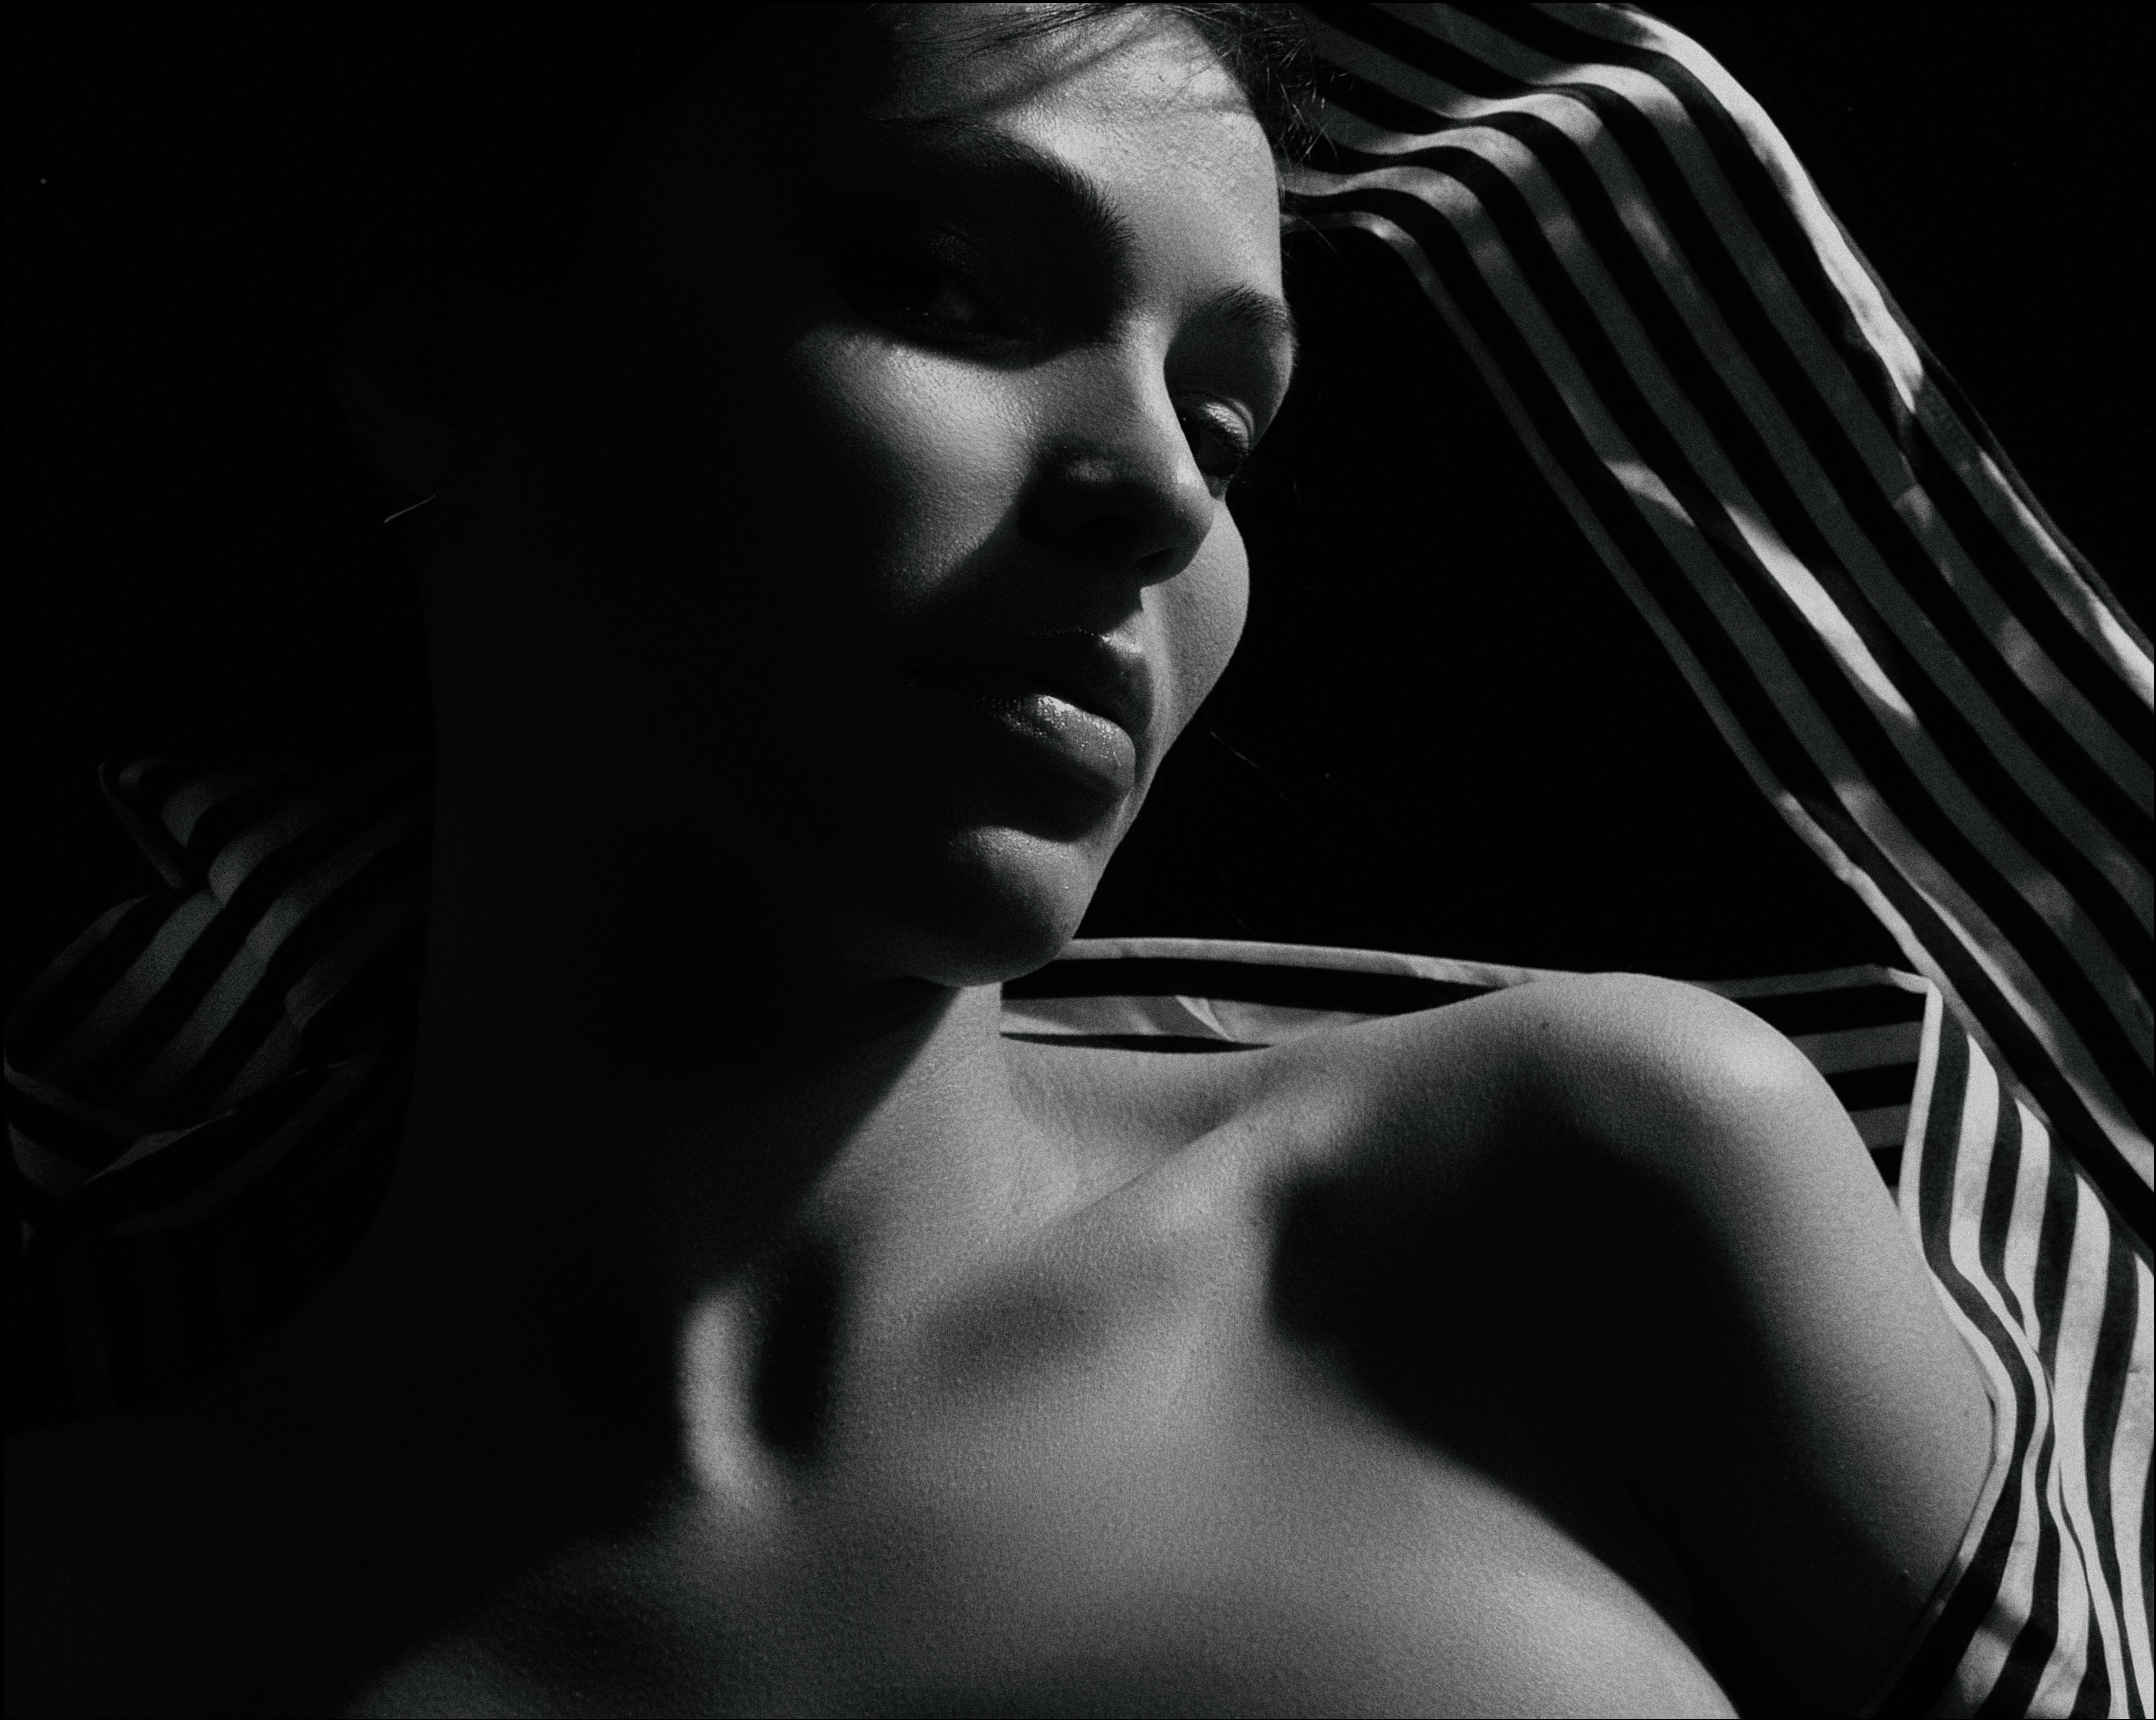 Základová fotografie zdarma na téma černobílá, dospělý, erotický, focení